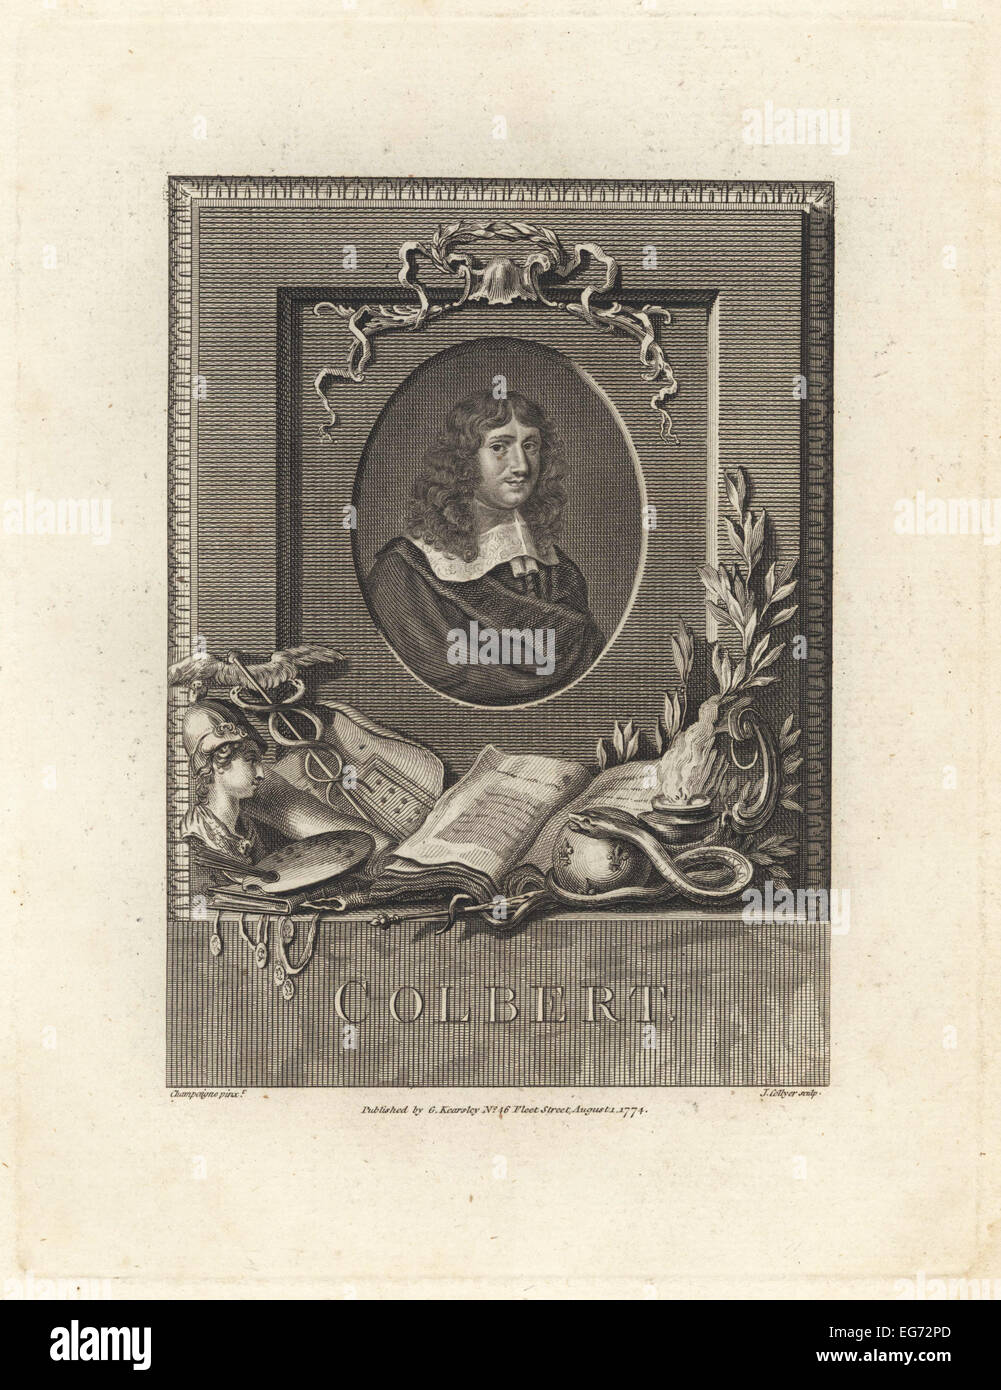 Jean Baptiste Colbert, statesman, minister to King Louis XIV. - Stock Image